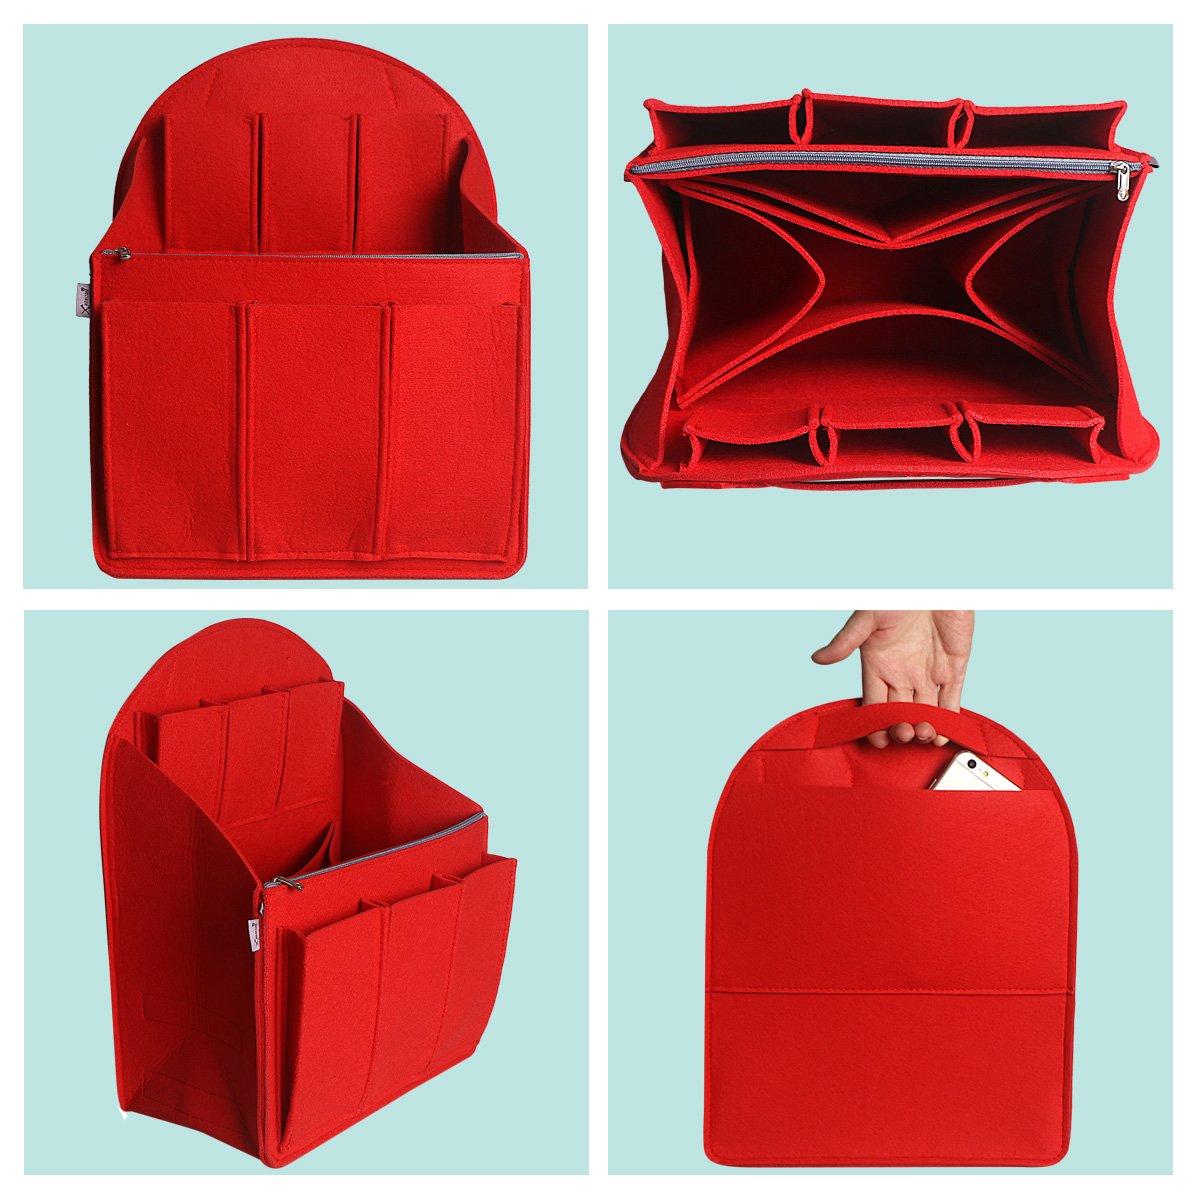 xhorizon SR Purse Organizer Insert Purse Handbag Tote Bag,Bag in Bag Organizer by xhorizon (Image #3)